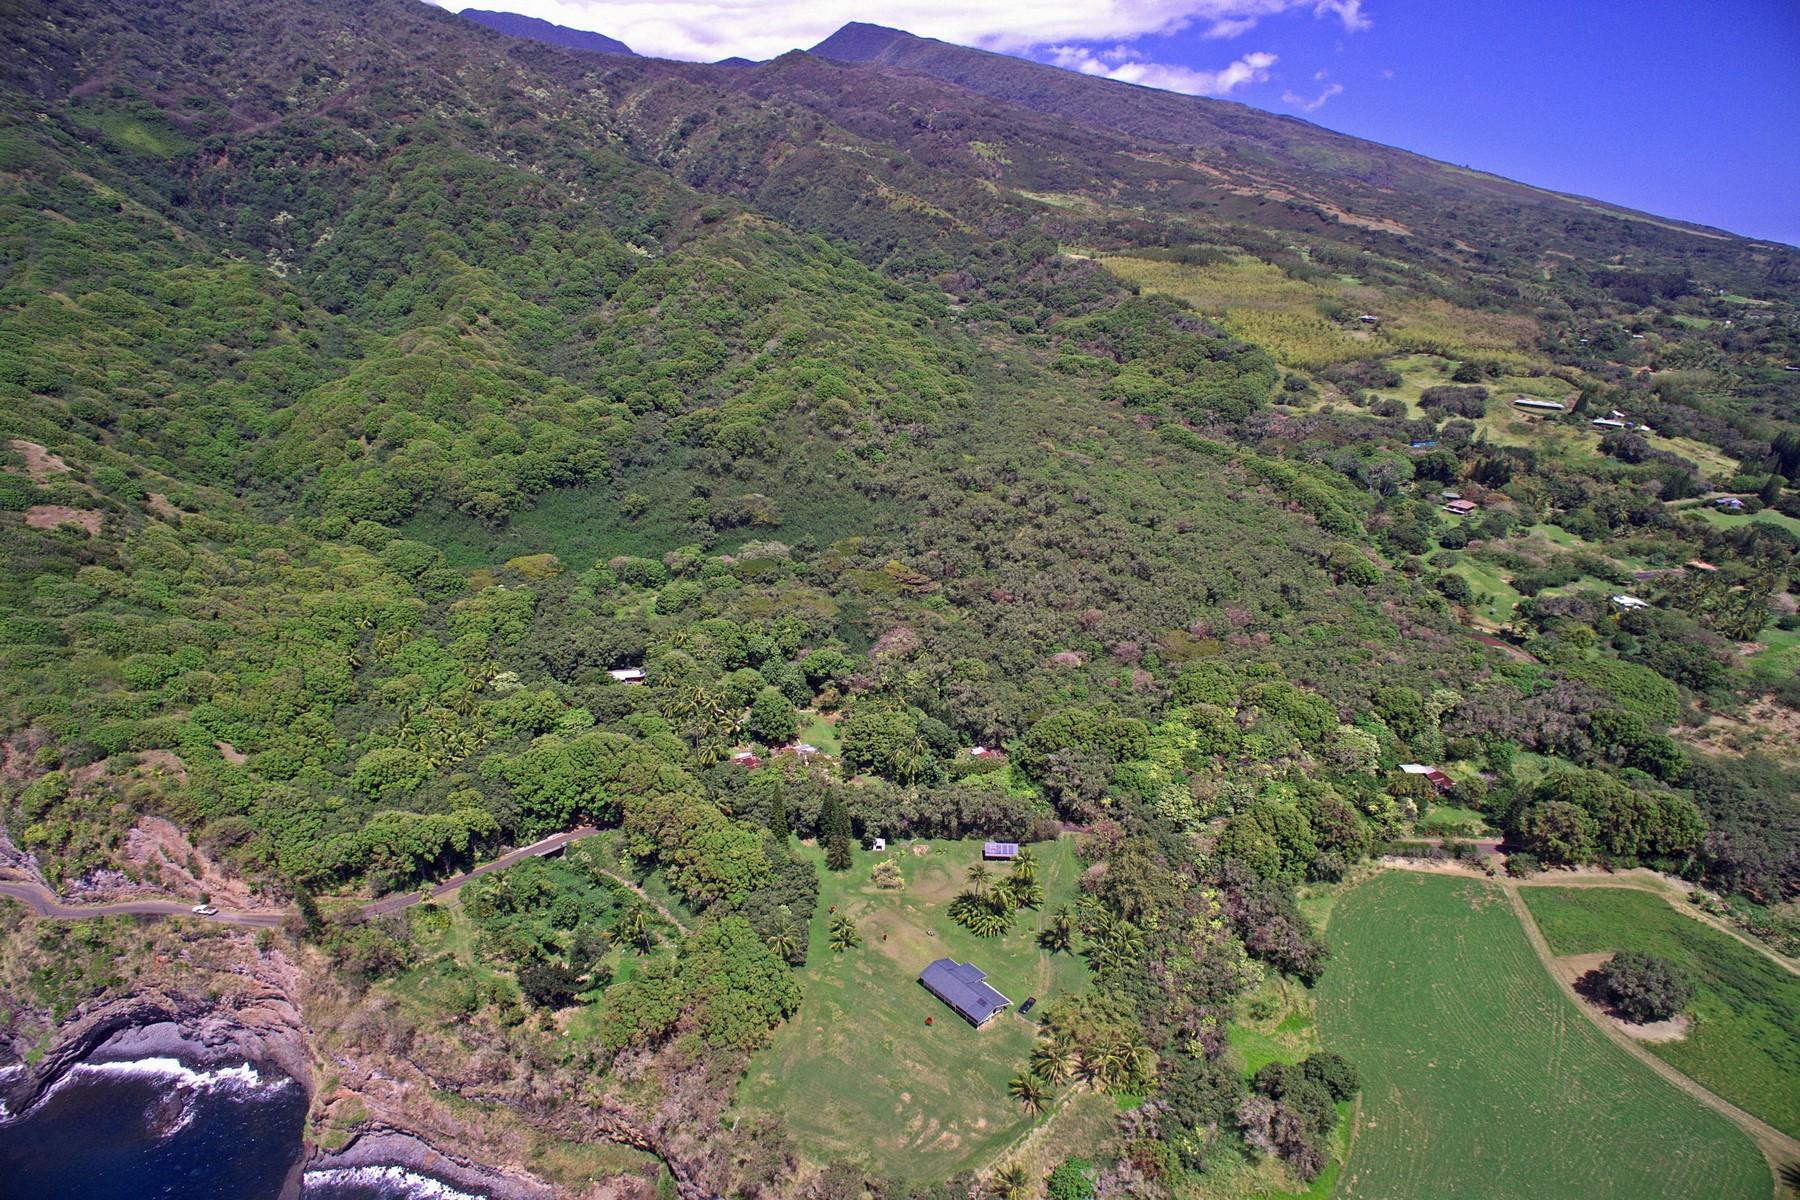 Land for Sale at 14 Acres Kipahulu Rare Find, East Maui Hana Hwy Hana, Hawaii 96713 United States